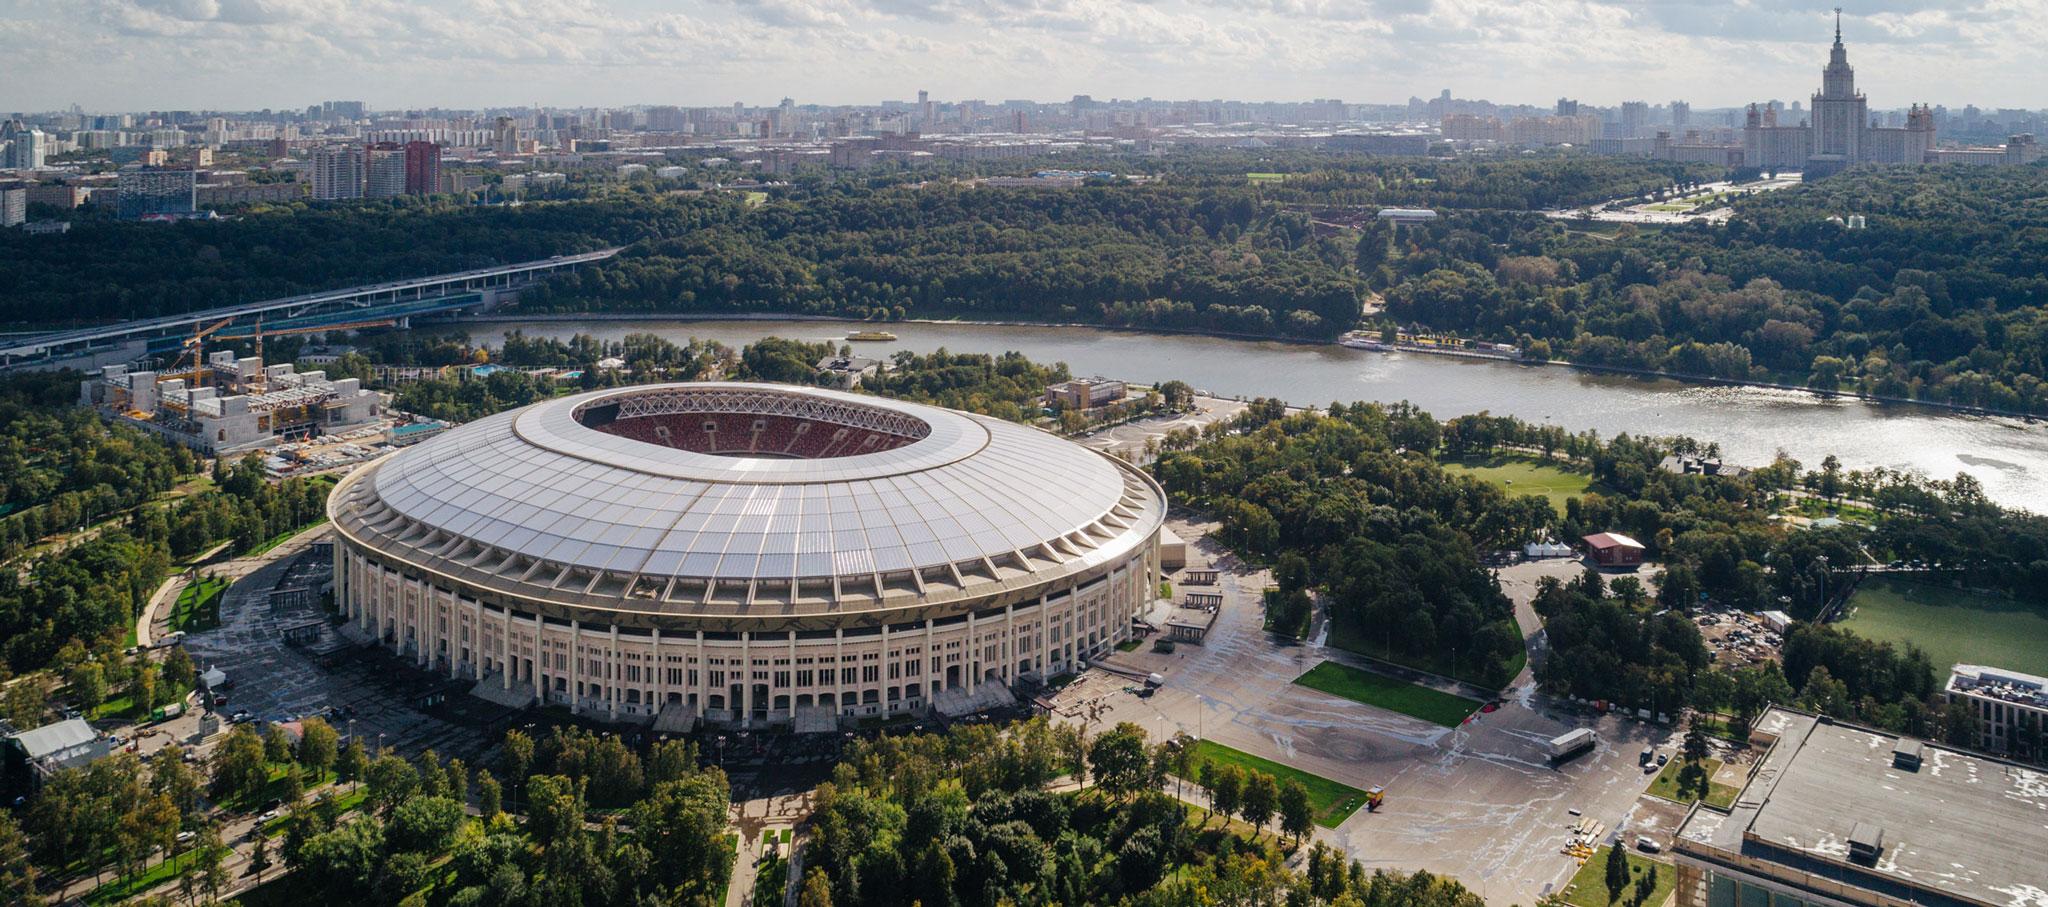 2018 World Cup. Luzhniki Stadium by Speech. Photograph by Ilya Ivanov